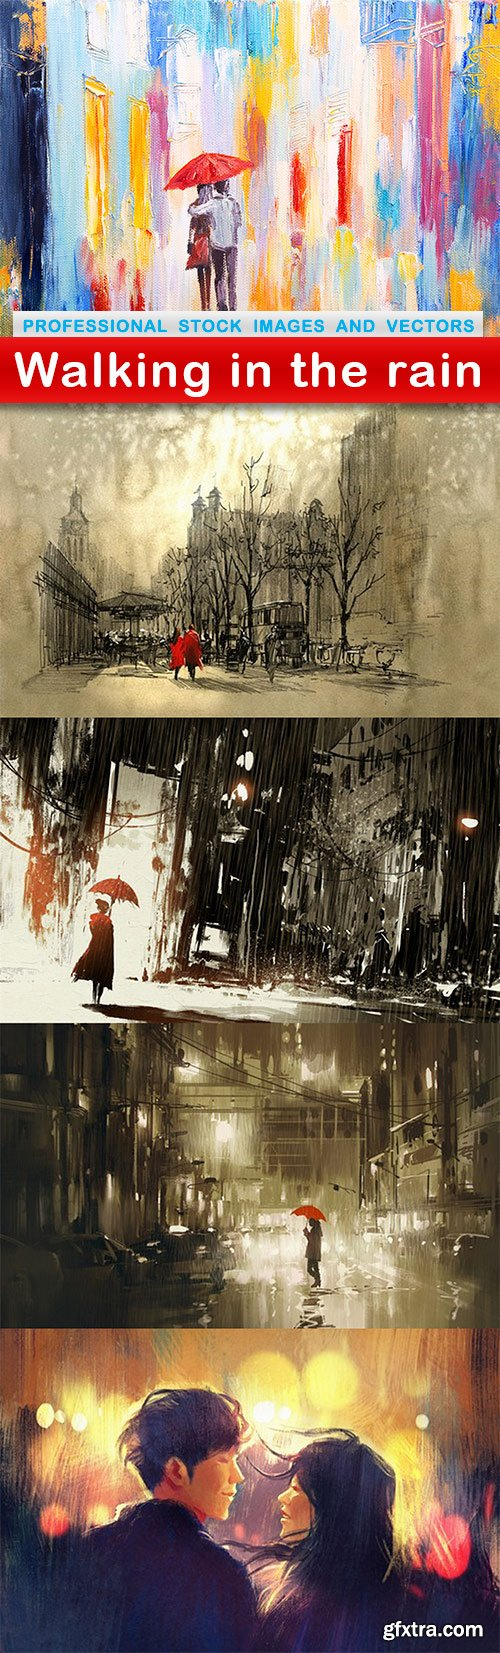 Walking in the rain - 5 UHQ JPEG